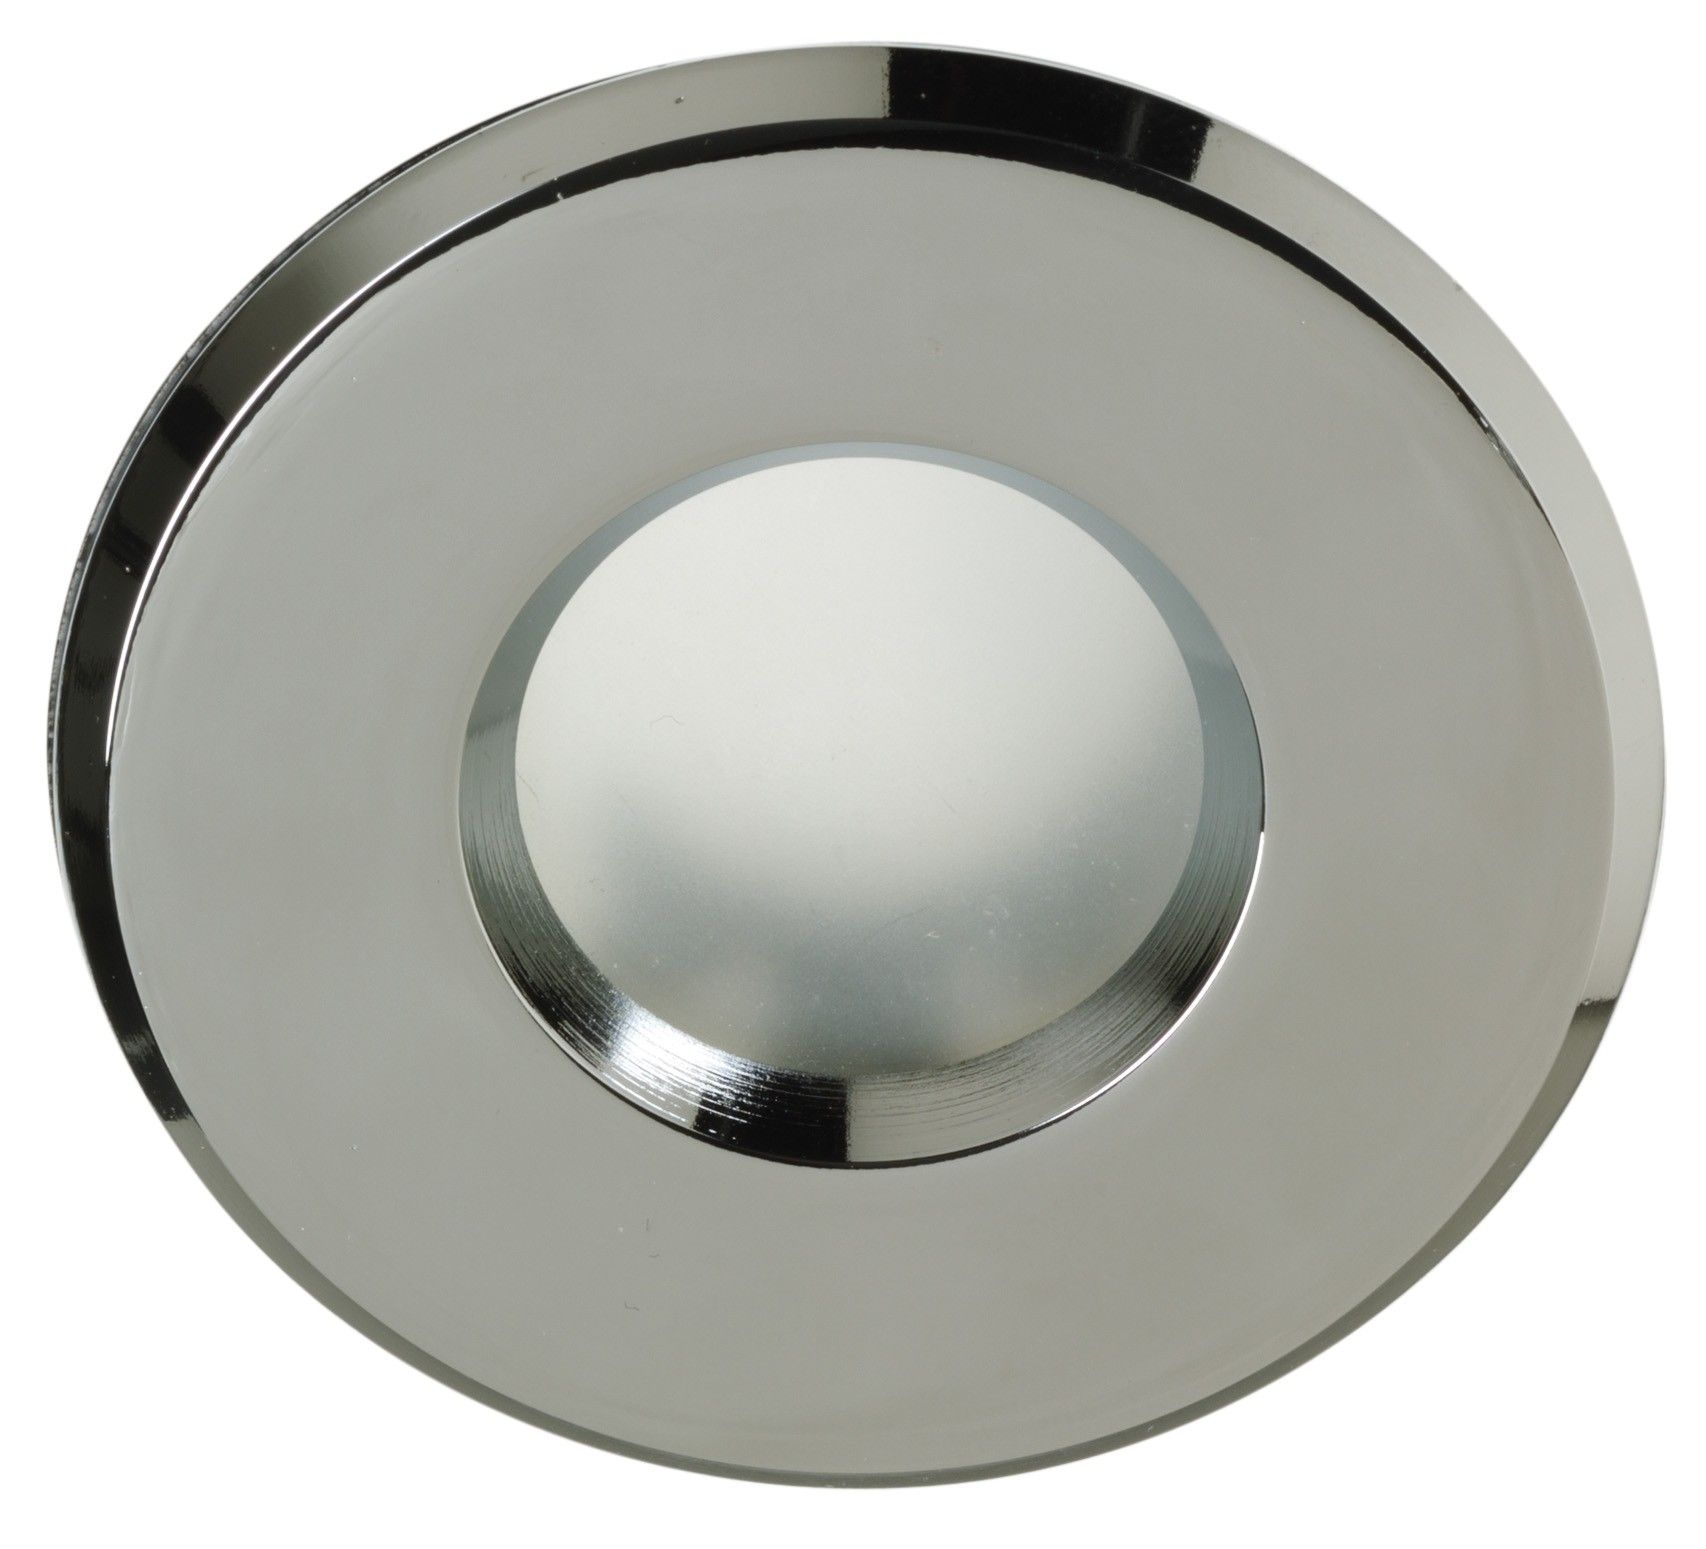 Image Result For Designer Decorative Bath Exhaust Fan